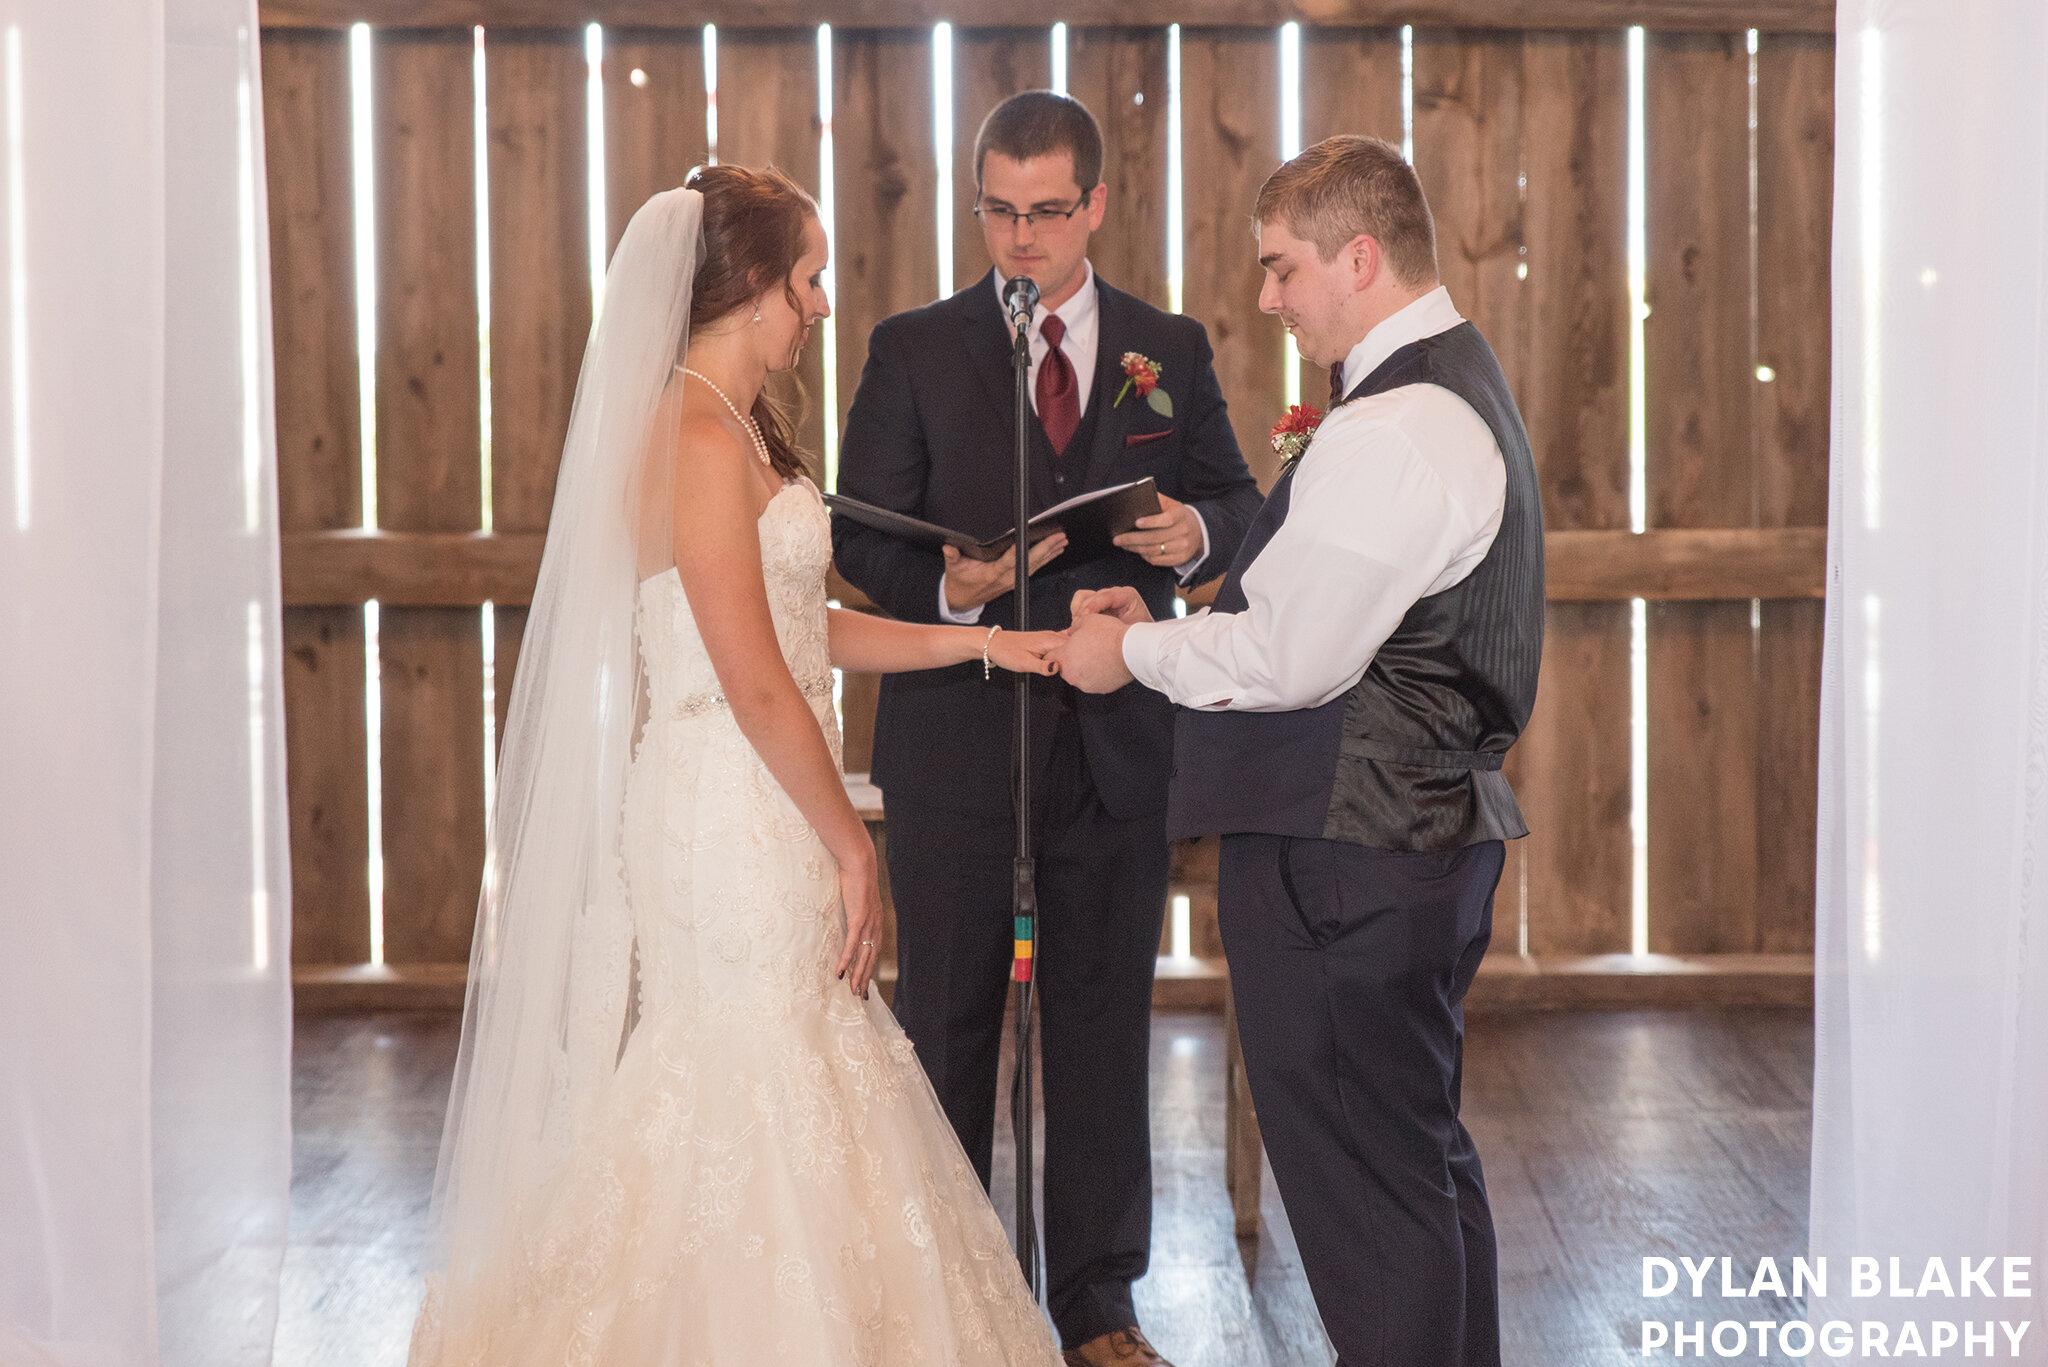 ryan-and-billy-brighton-acres-wedding0020.jpg